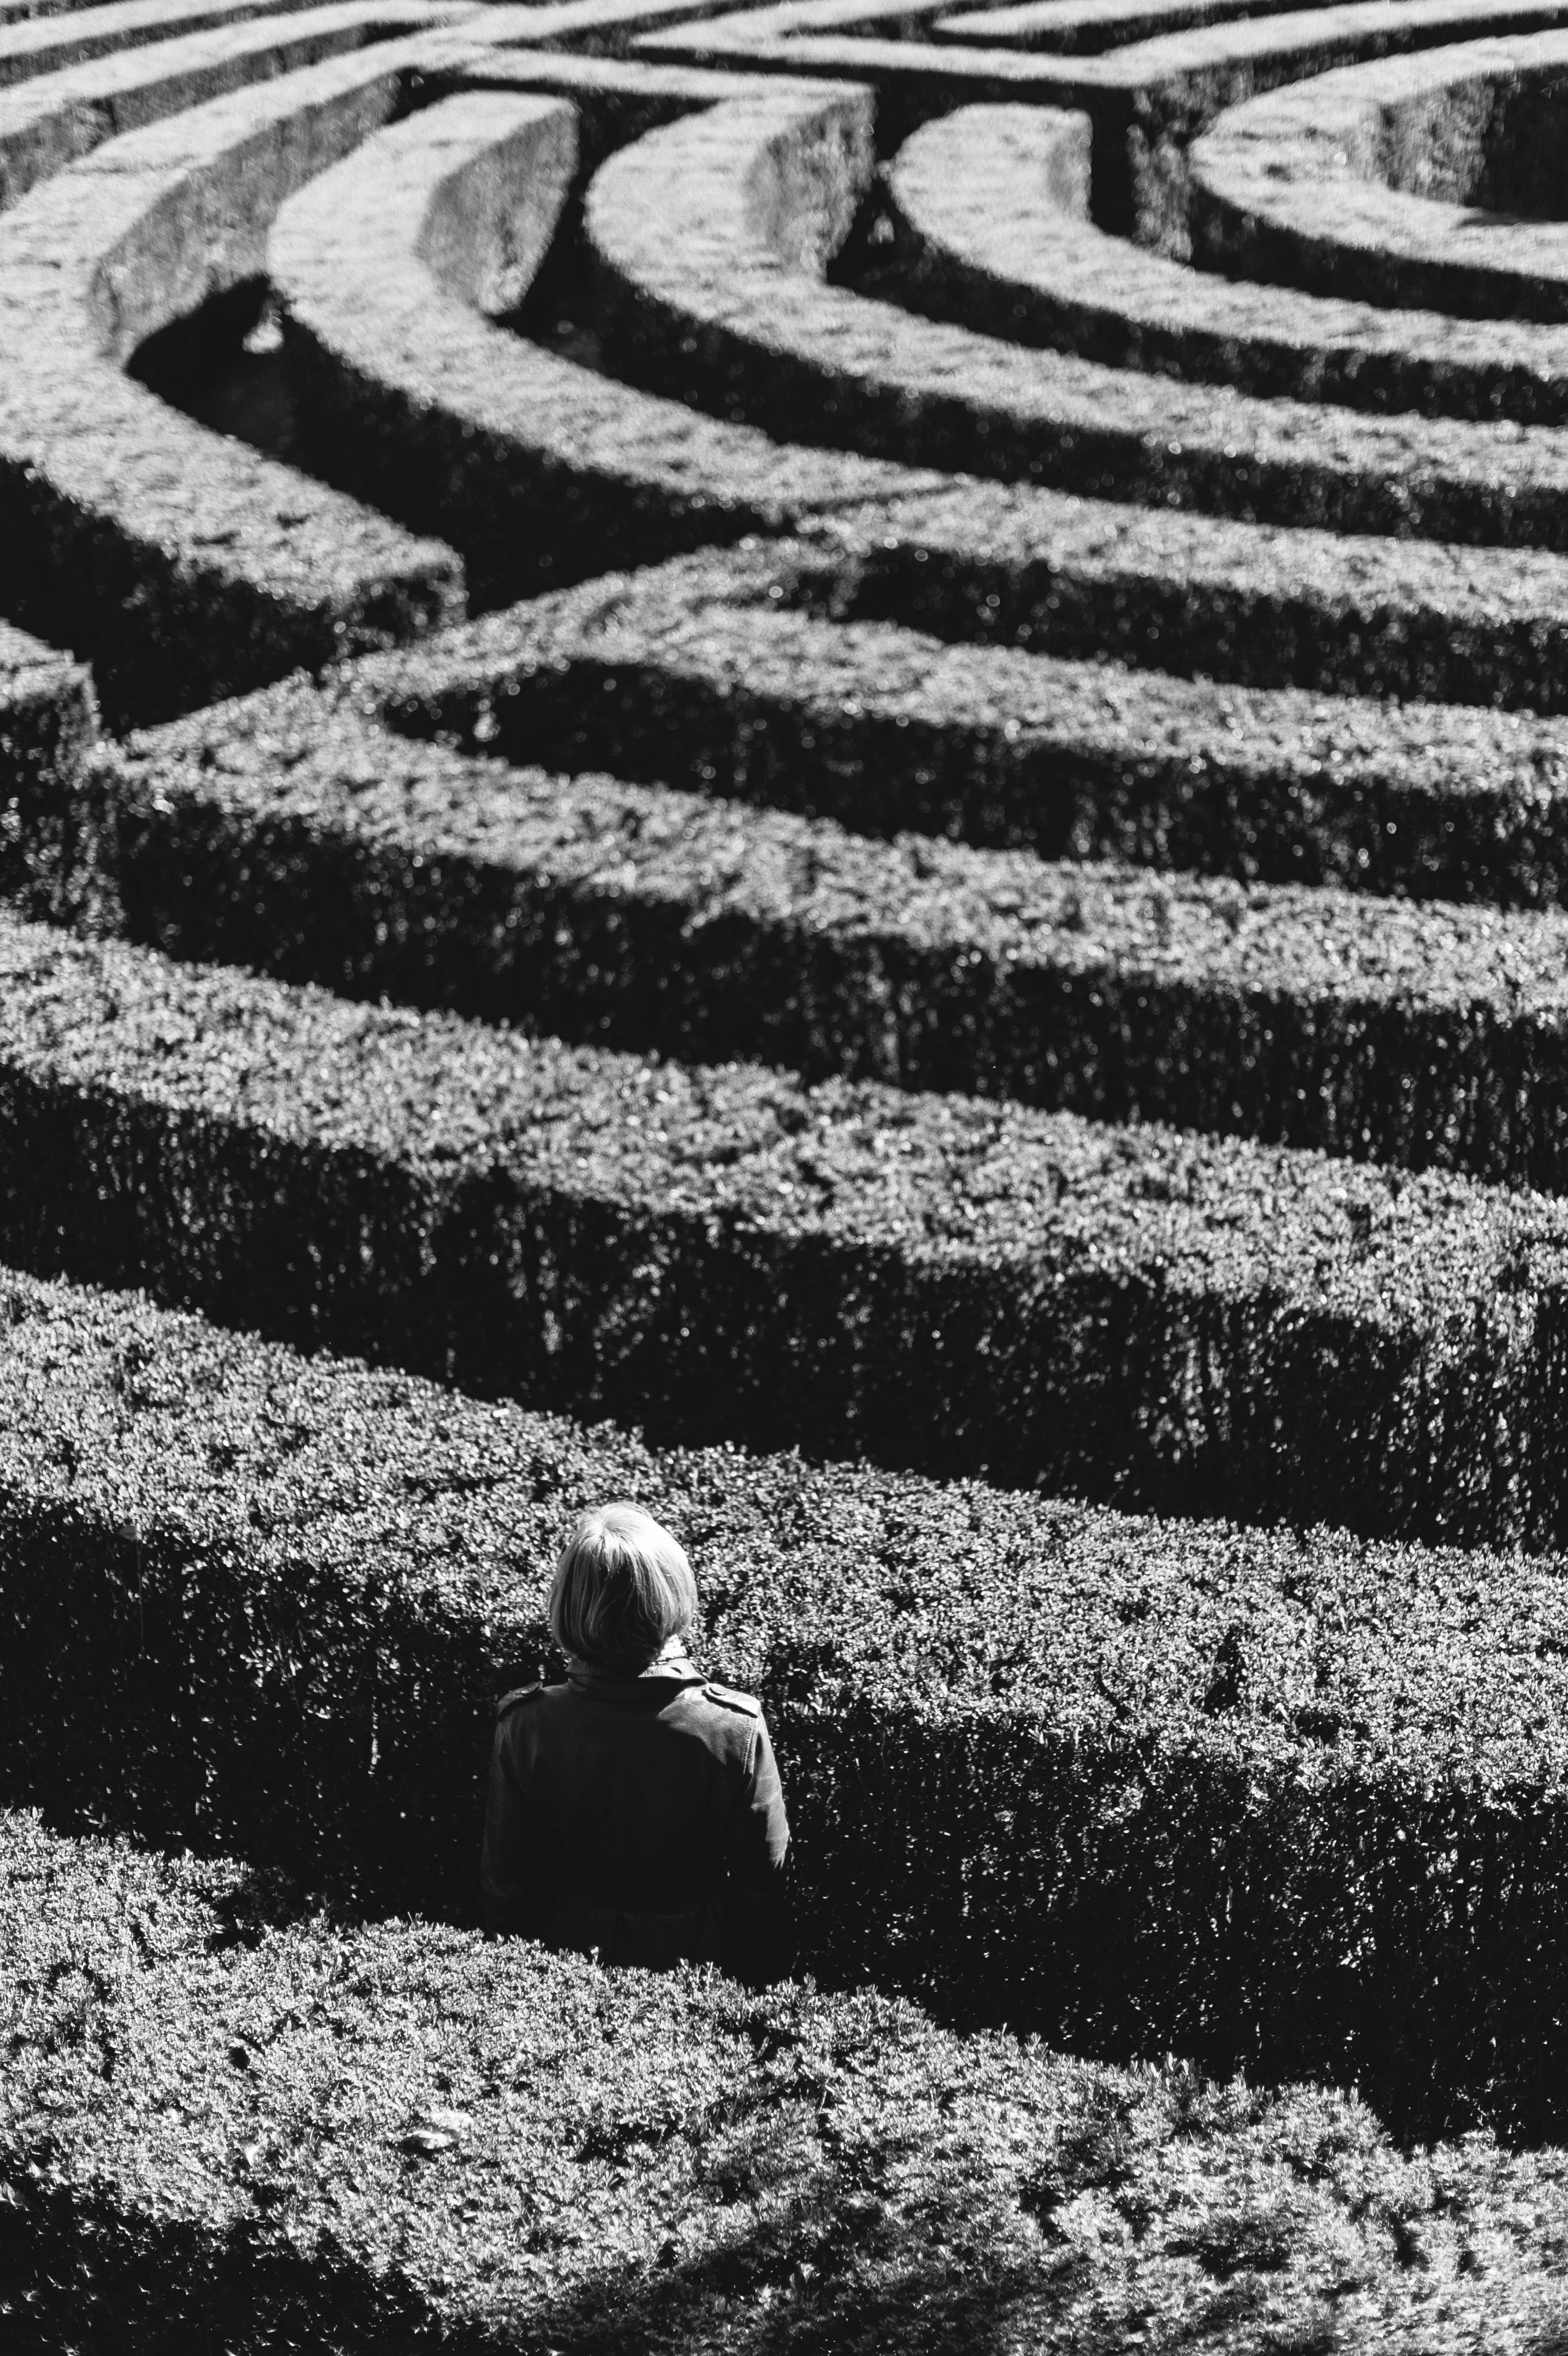 A woman lost in a corn maze